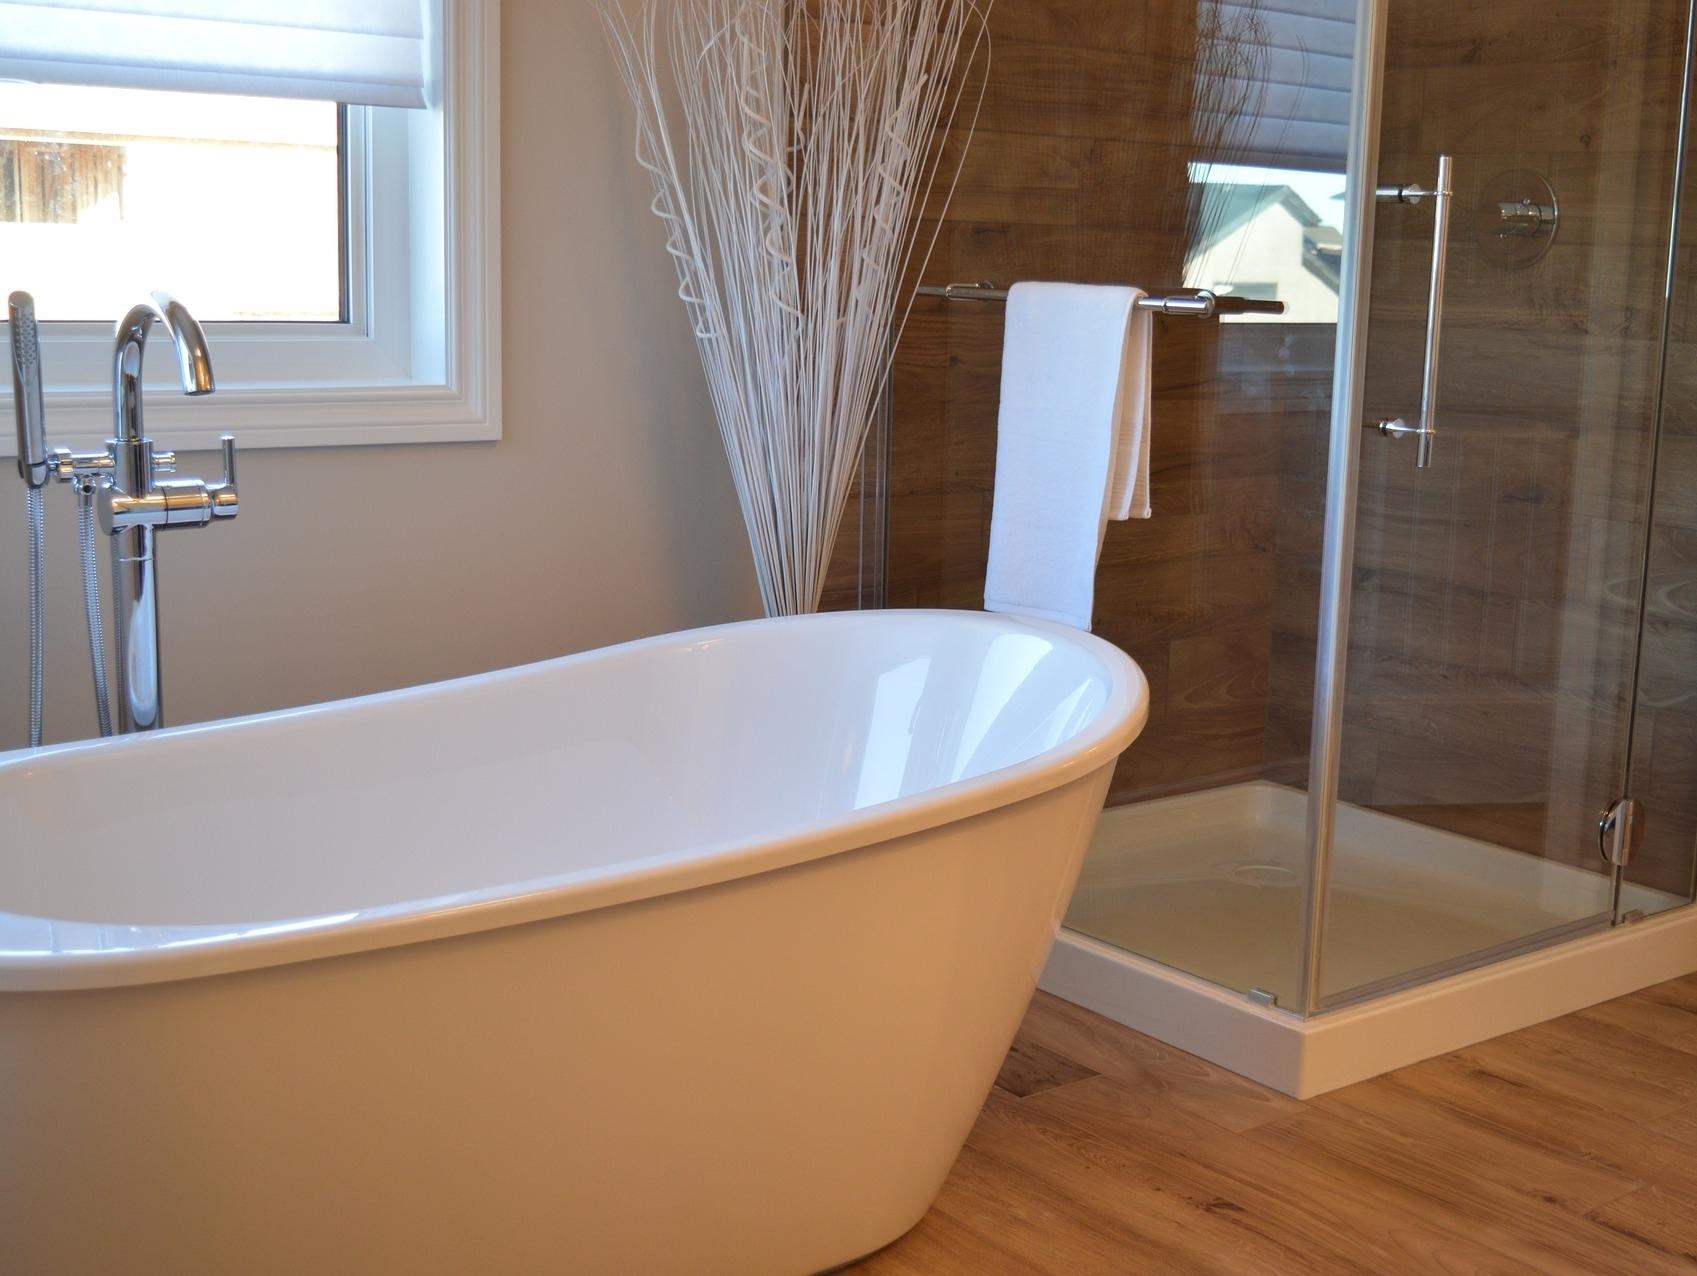 bathtub-1078929_1920.jpg